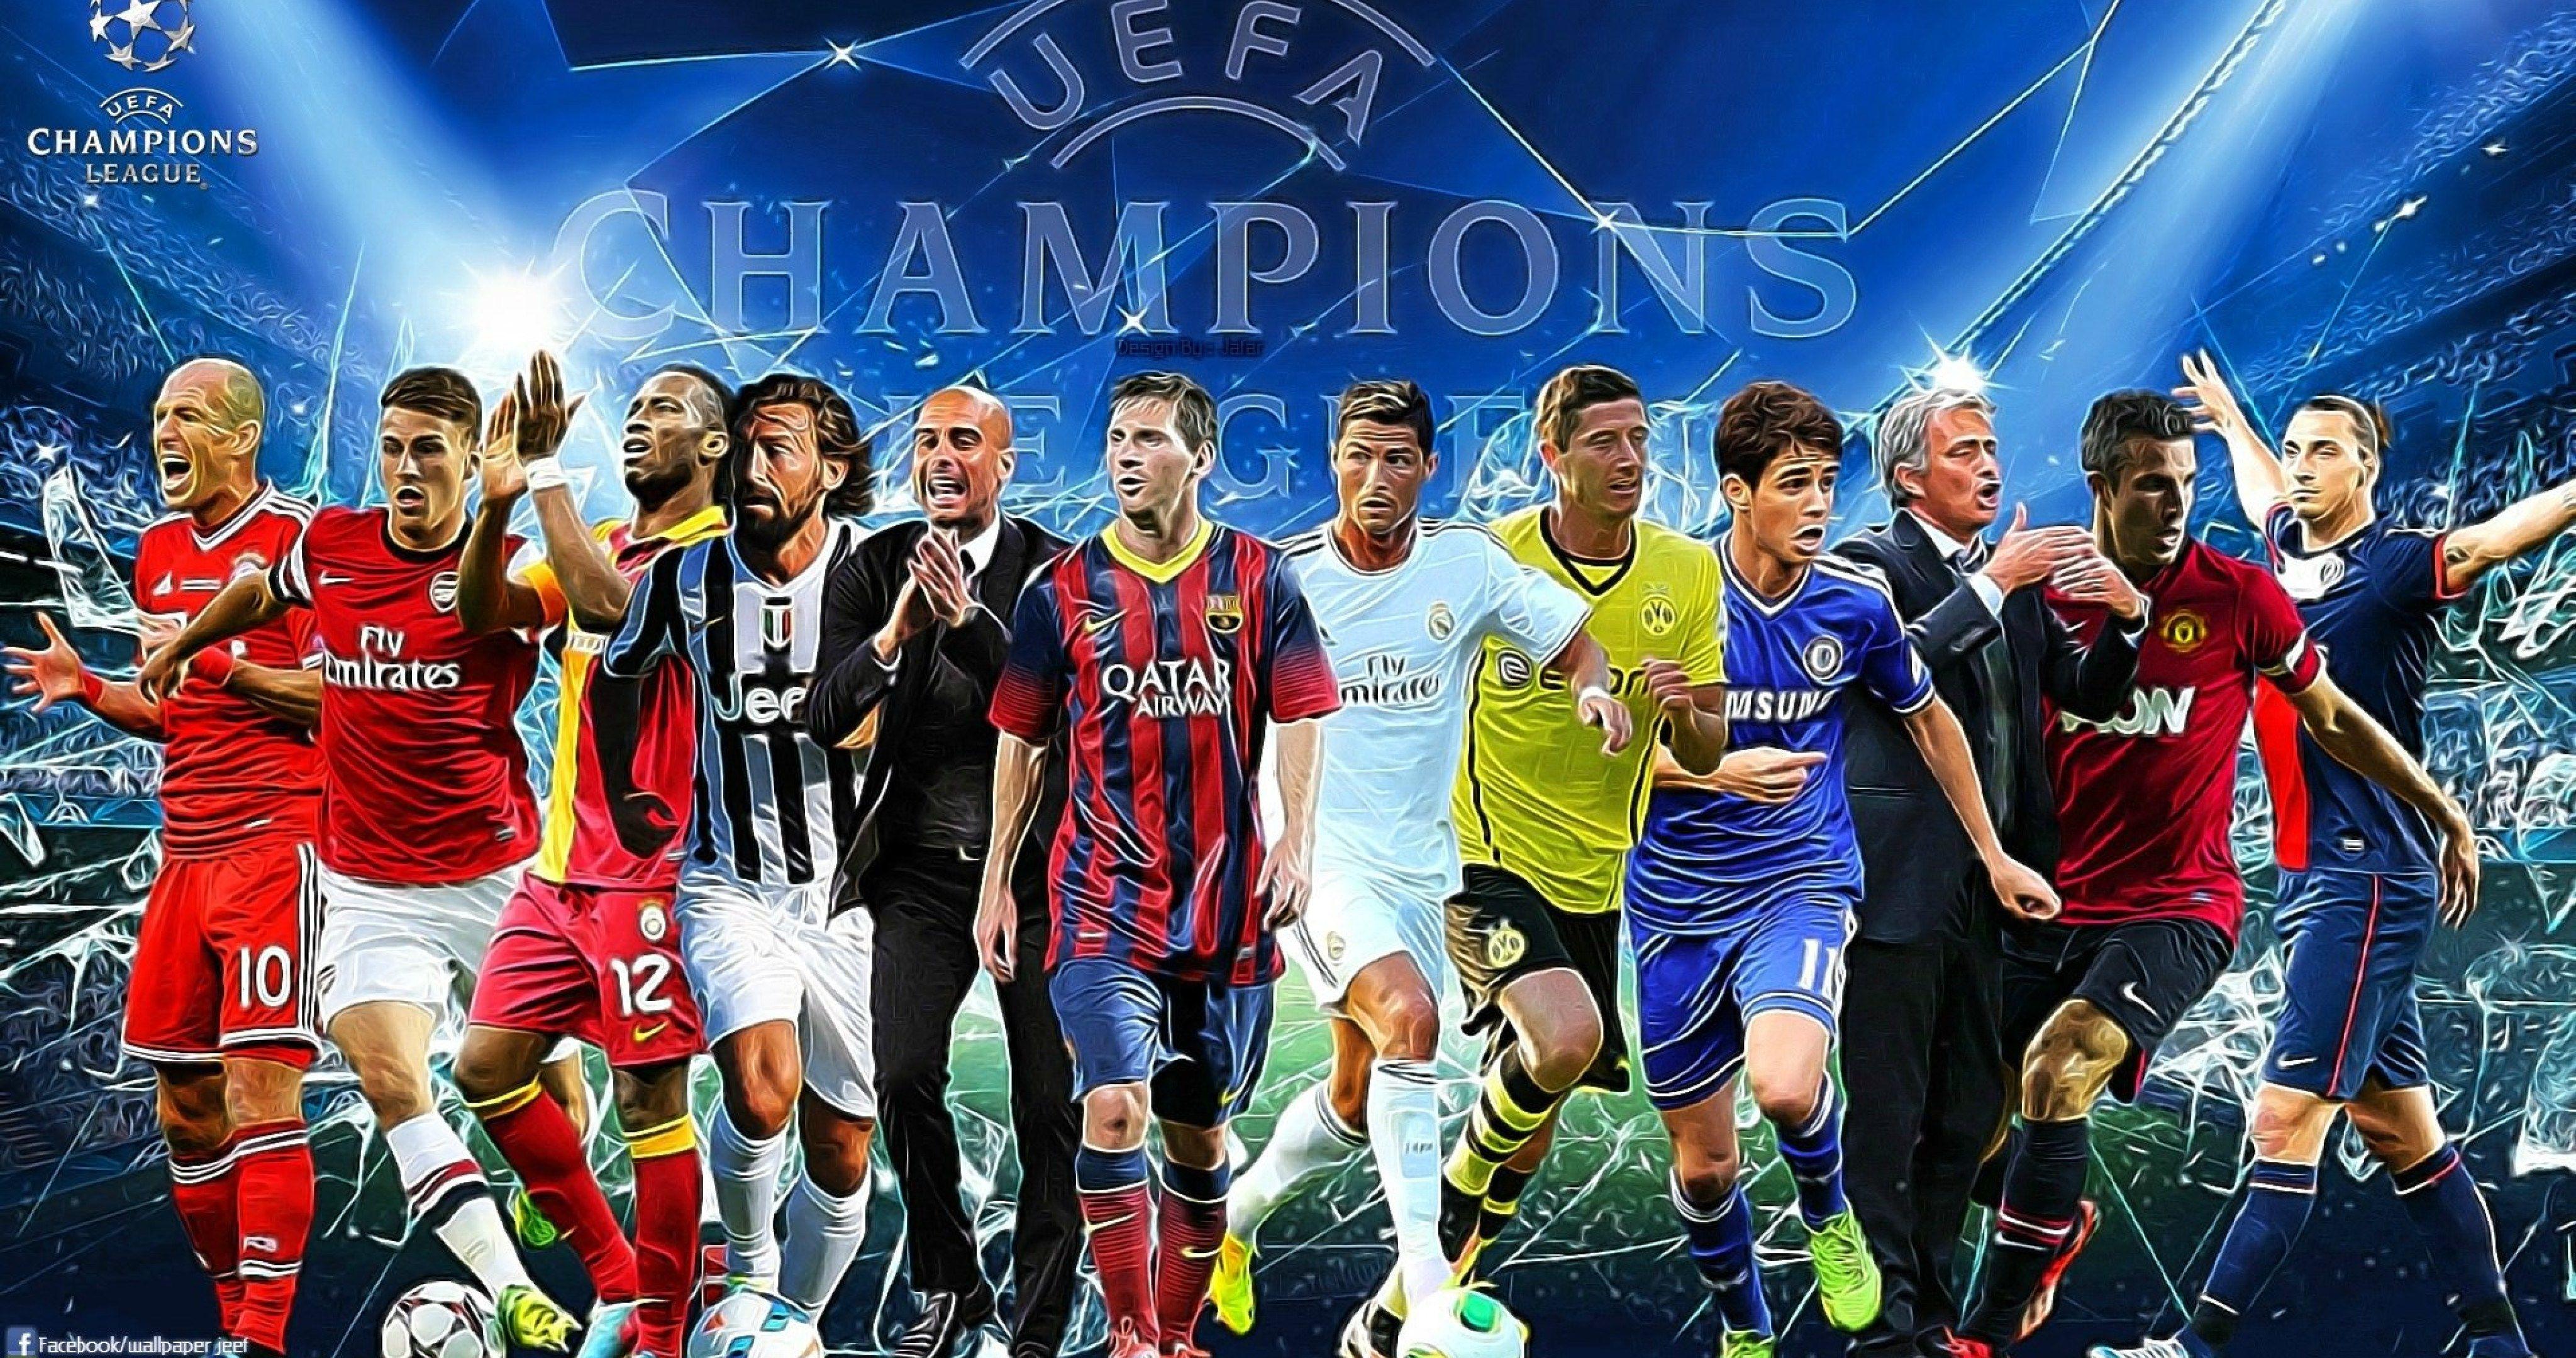 Uefa champions league 2013 2014 4k ultra hd wallpaper uefa champions league 2013 2014 4k ultra hd wallpaper voltagebd Images